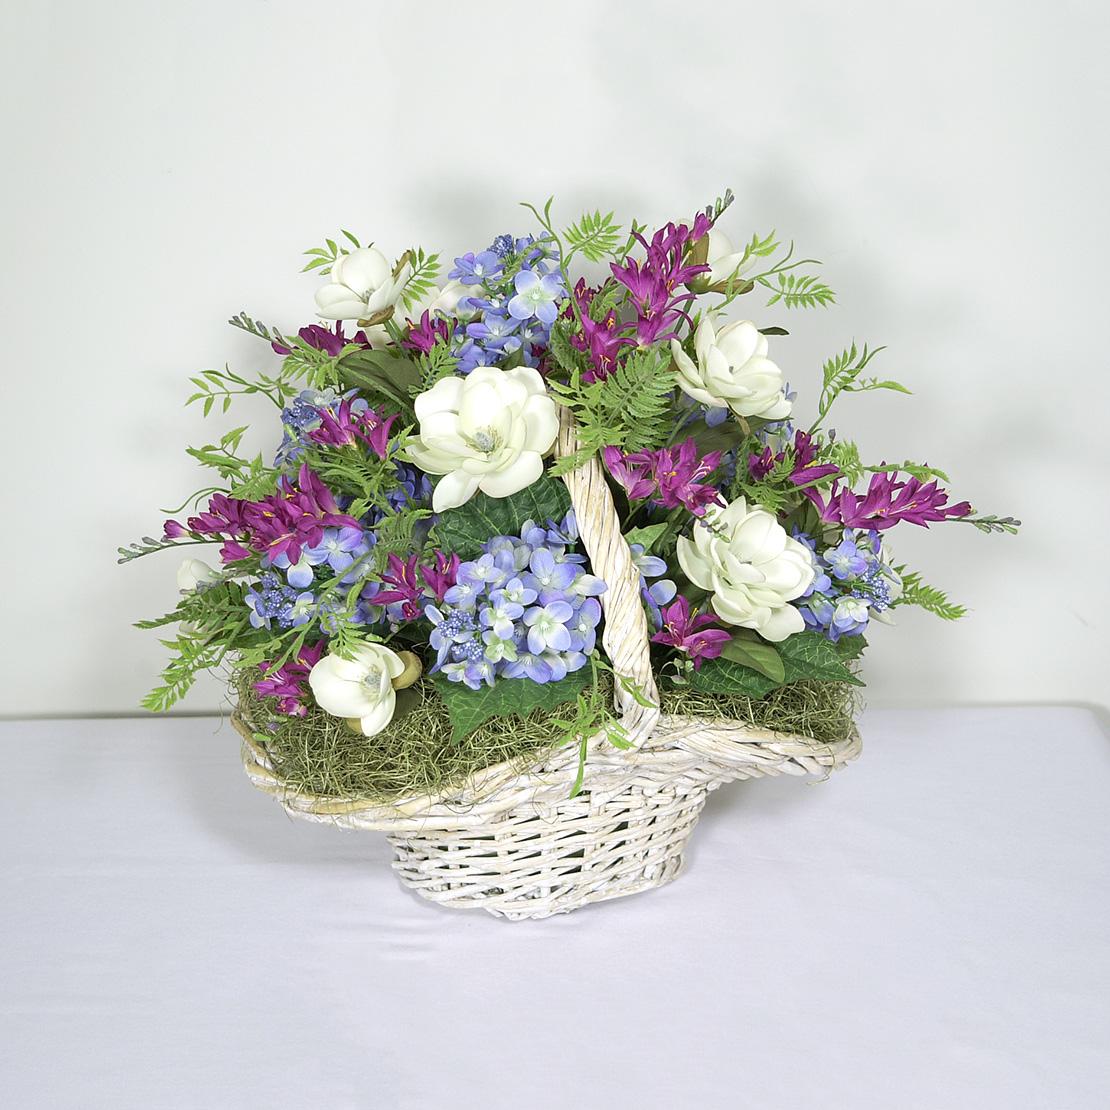 Quot hand picked flower basket centerpiece wreaths unlimited